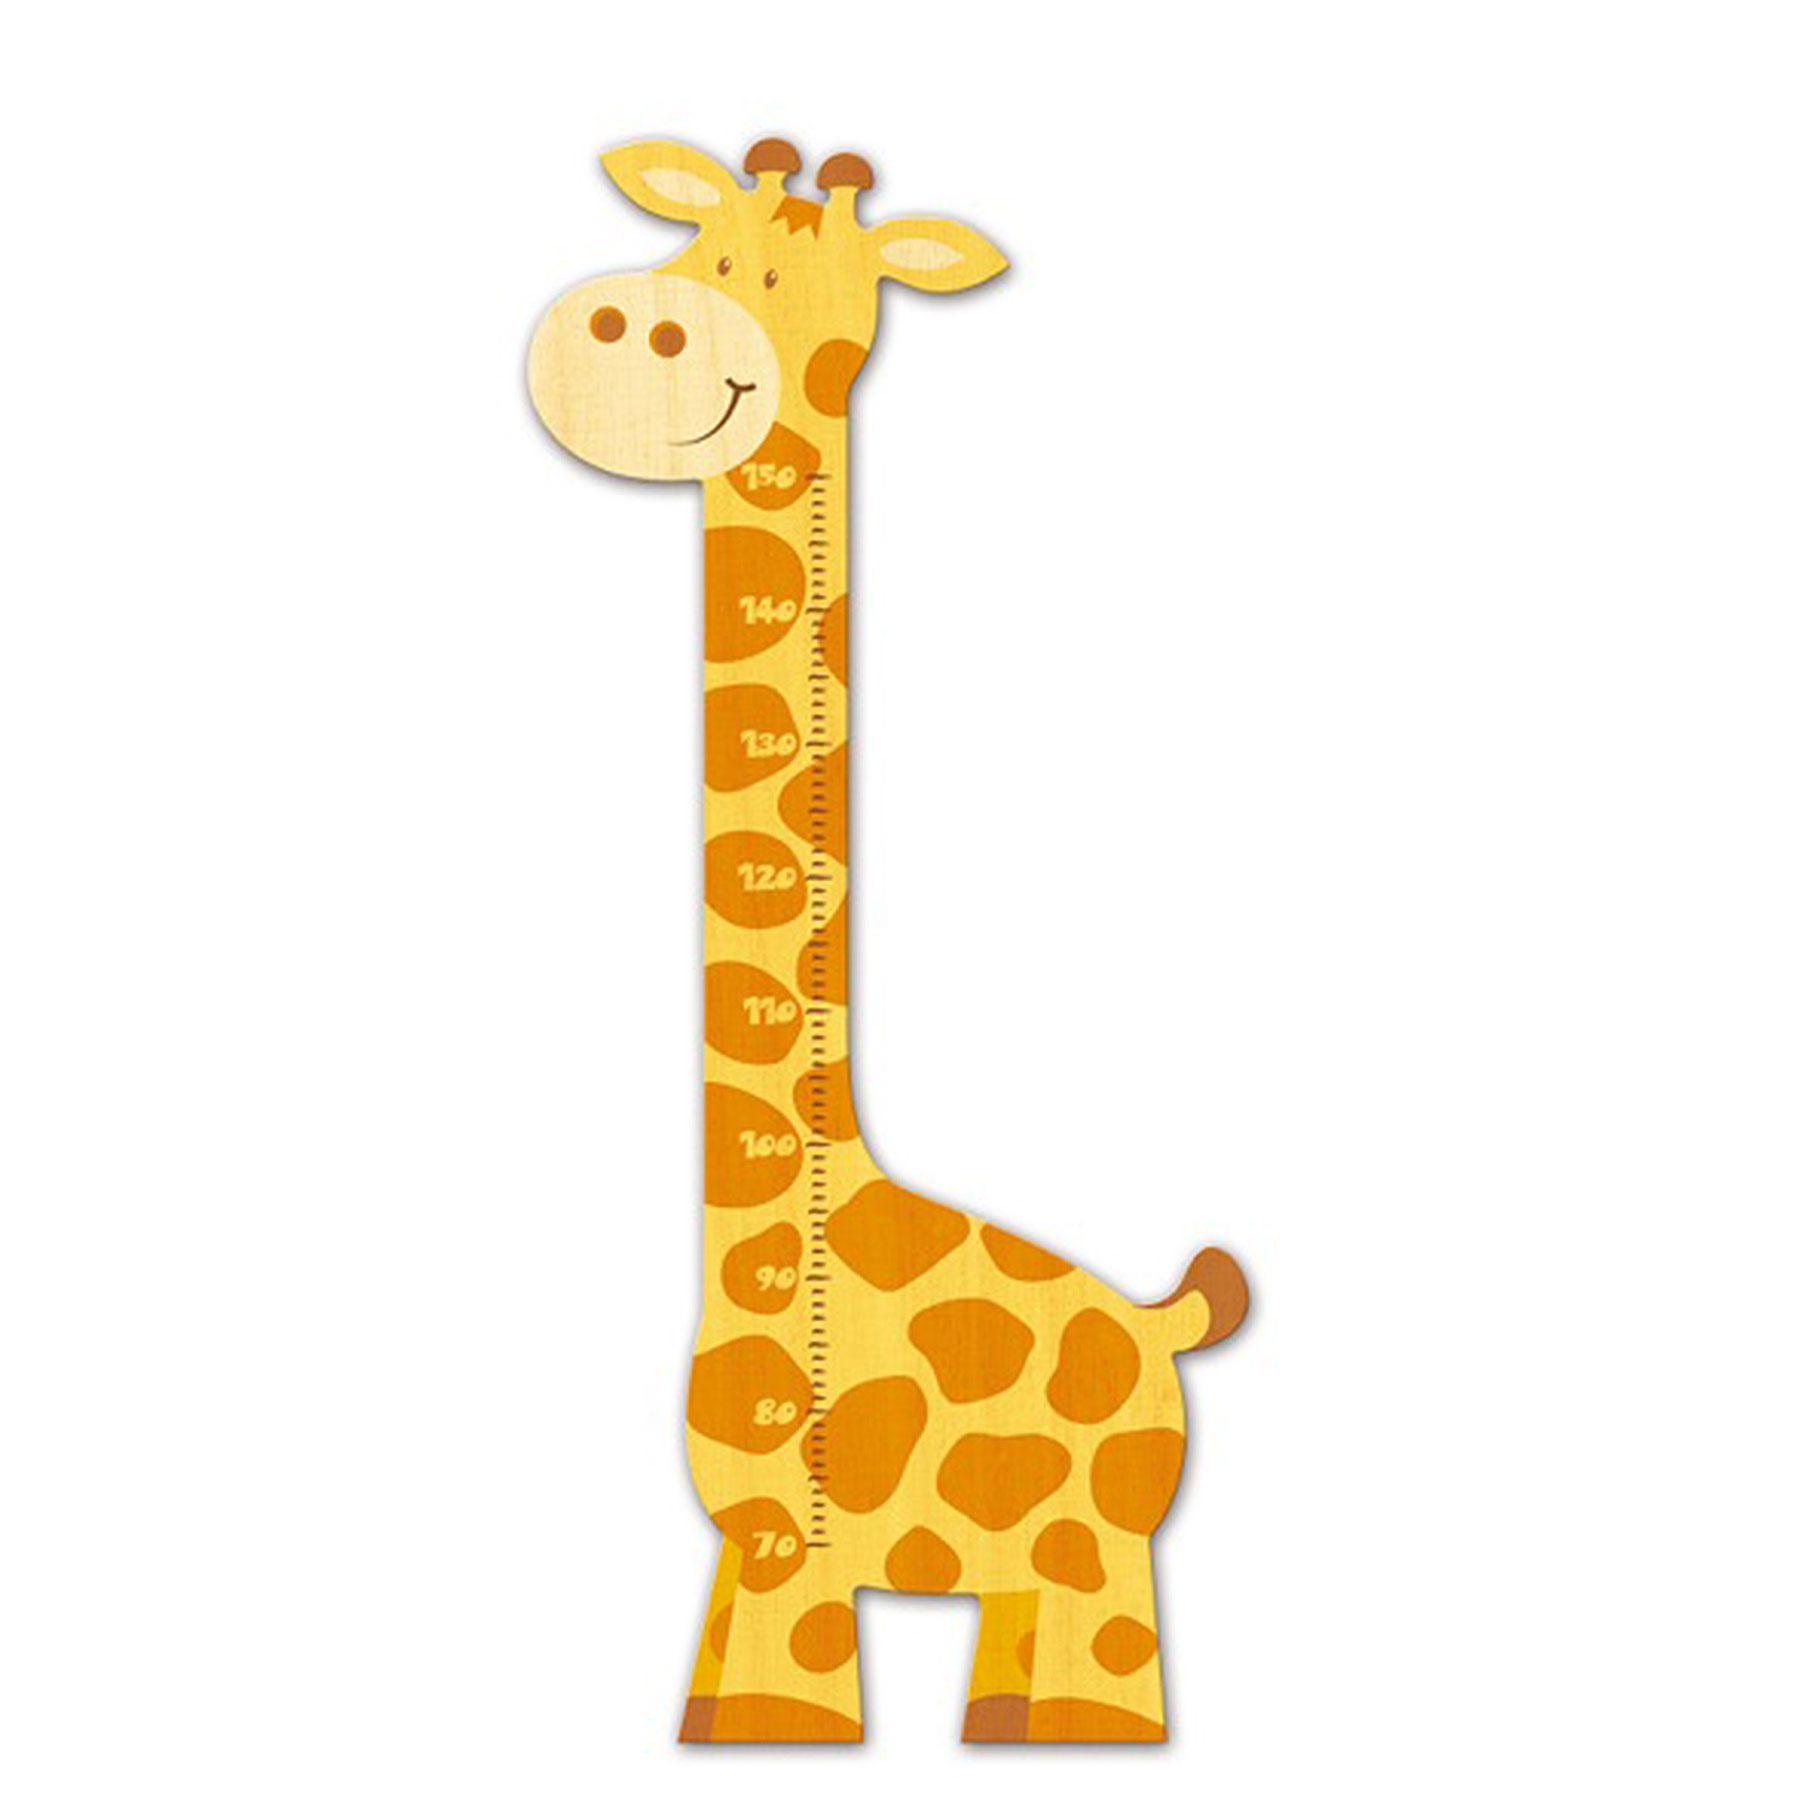 Full Size of Messlatte Giraffe Aus Holz Regale Kinderzimmer Sofa Regal Weiß Kinderzimmer Messlatte Kinderzimmer